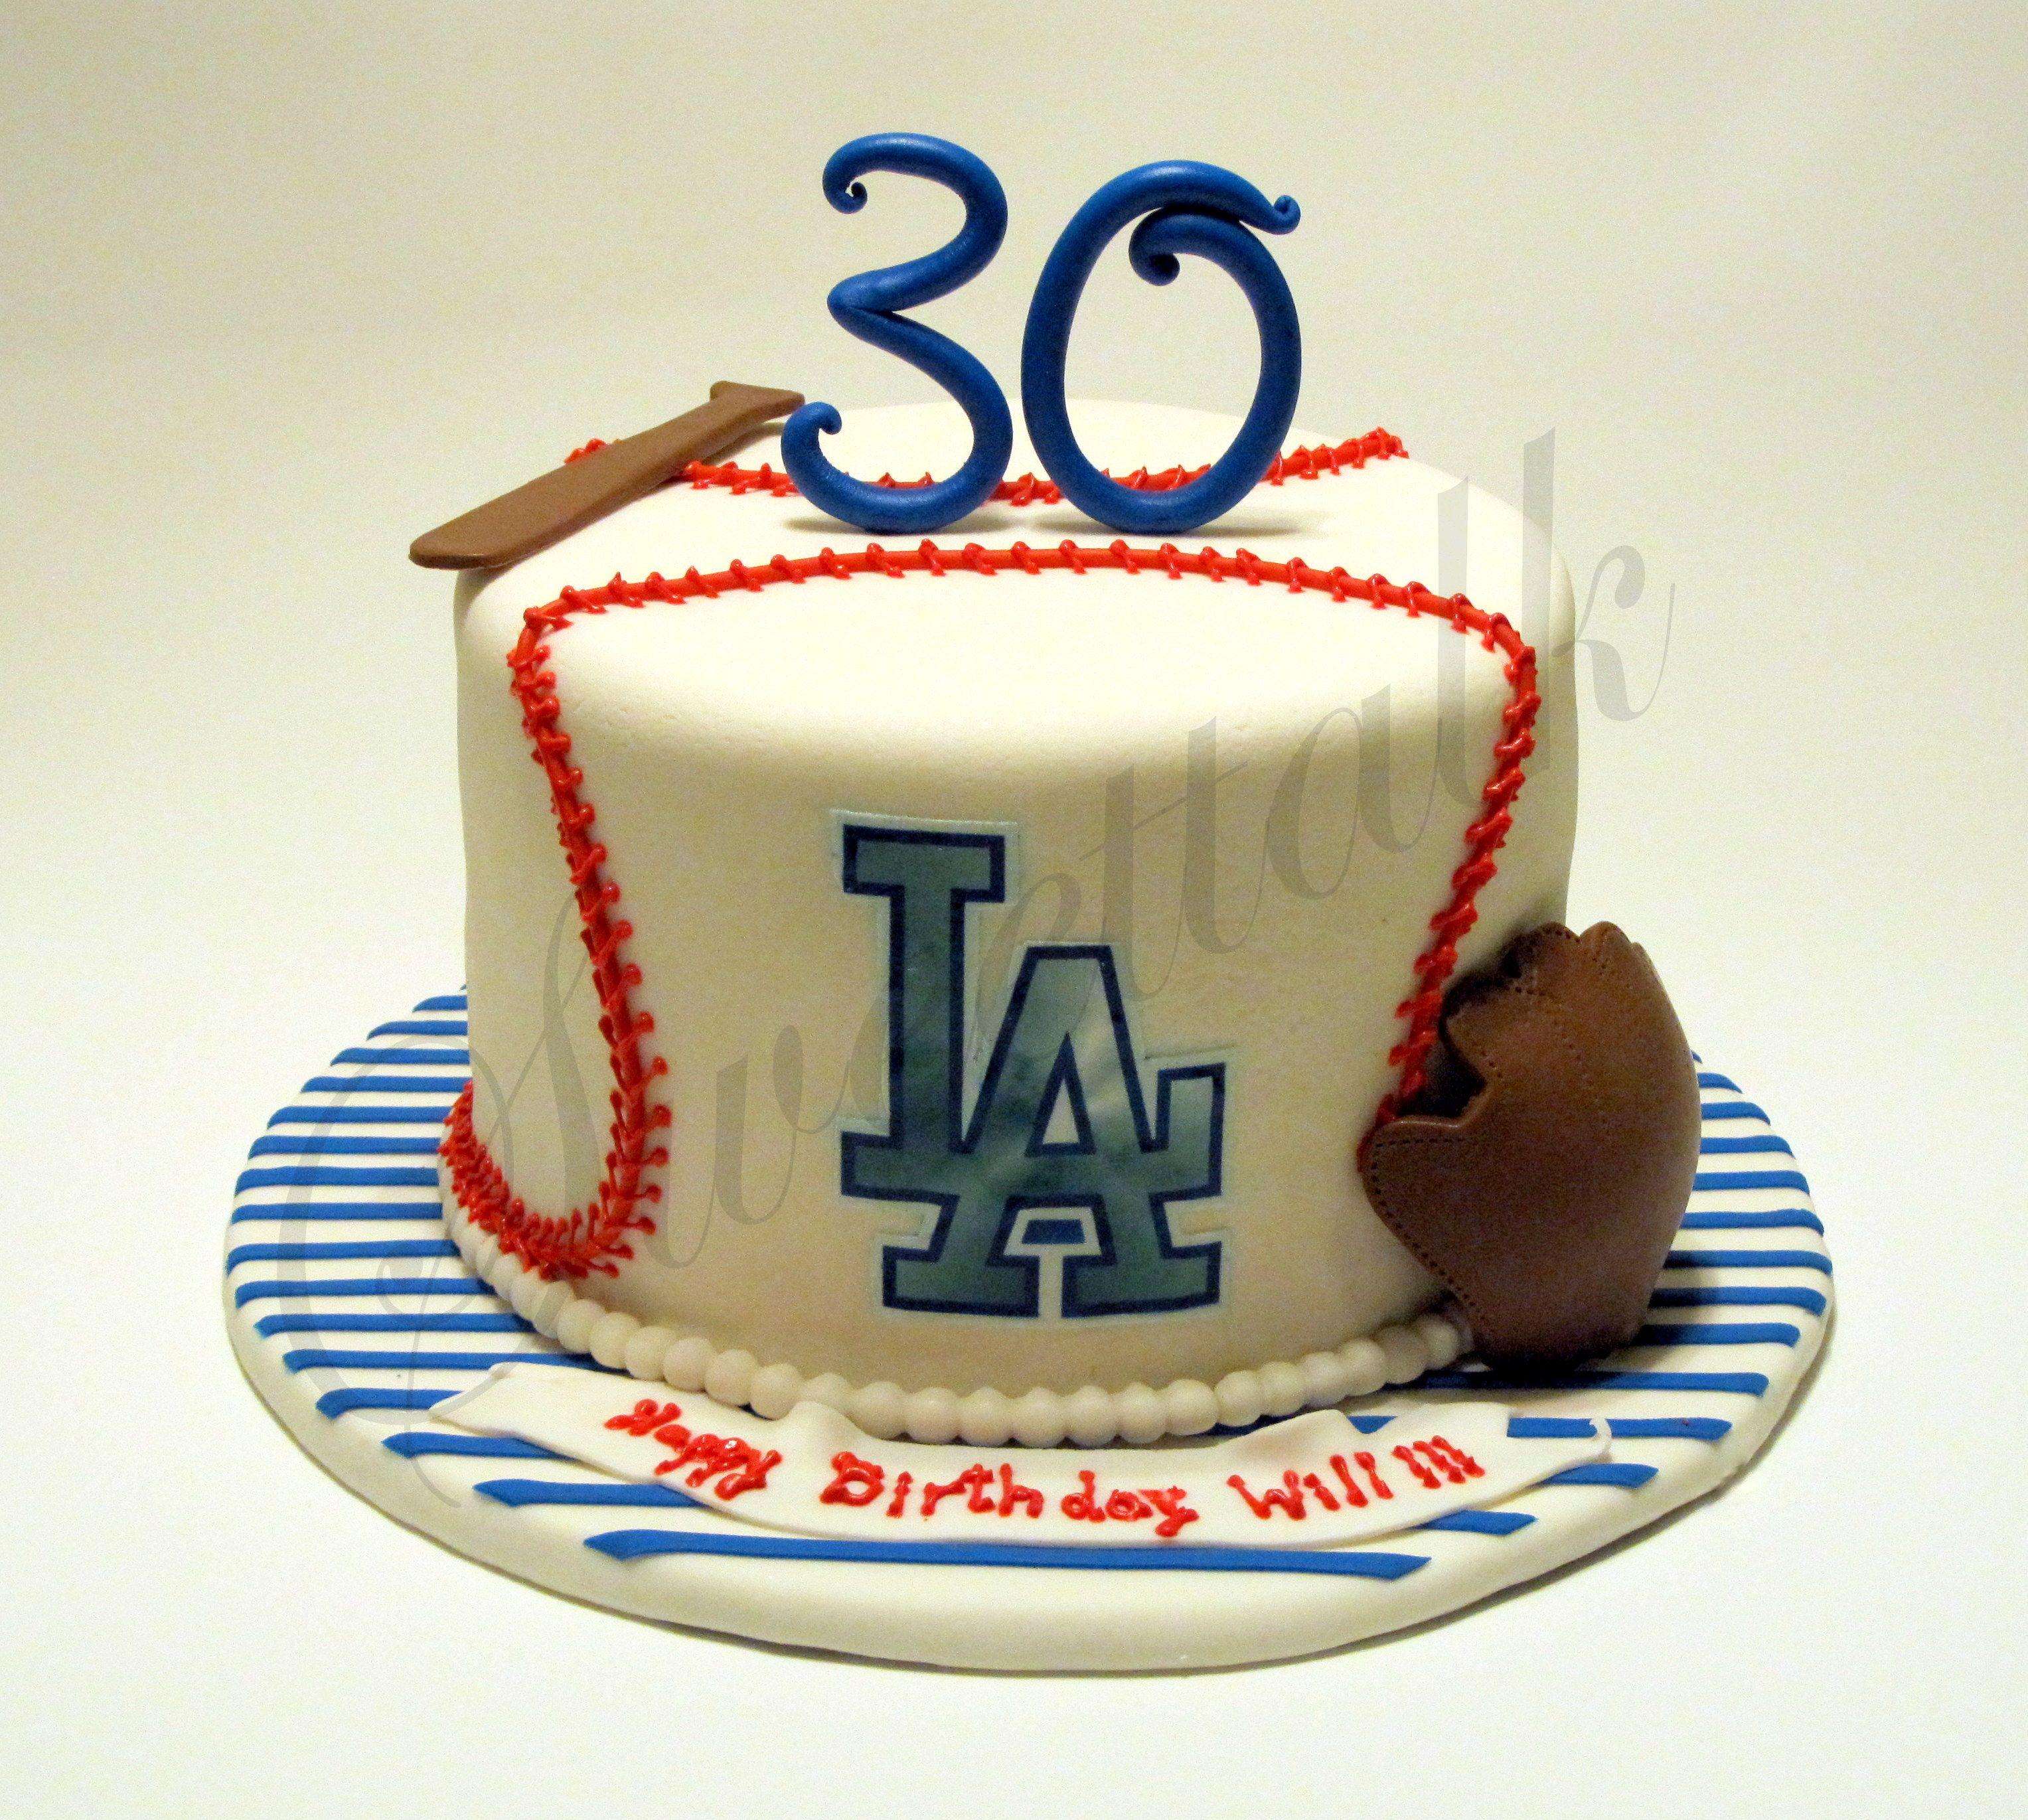 LA Dodgers Baseball cake Los Angeles Dodgers Baseball cake